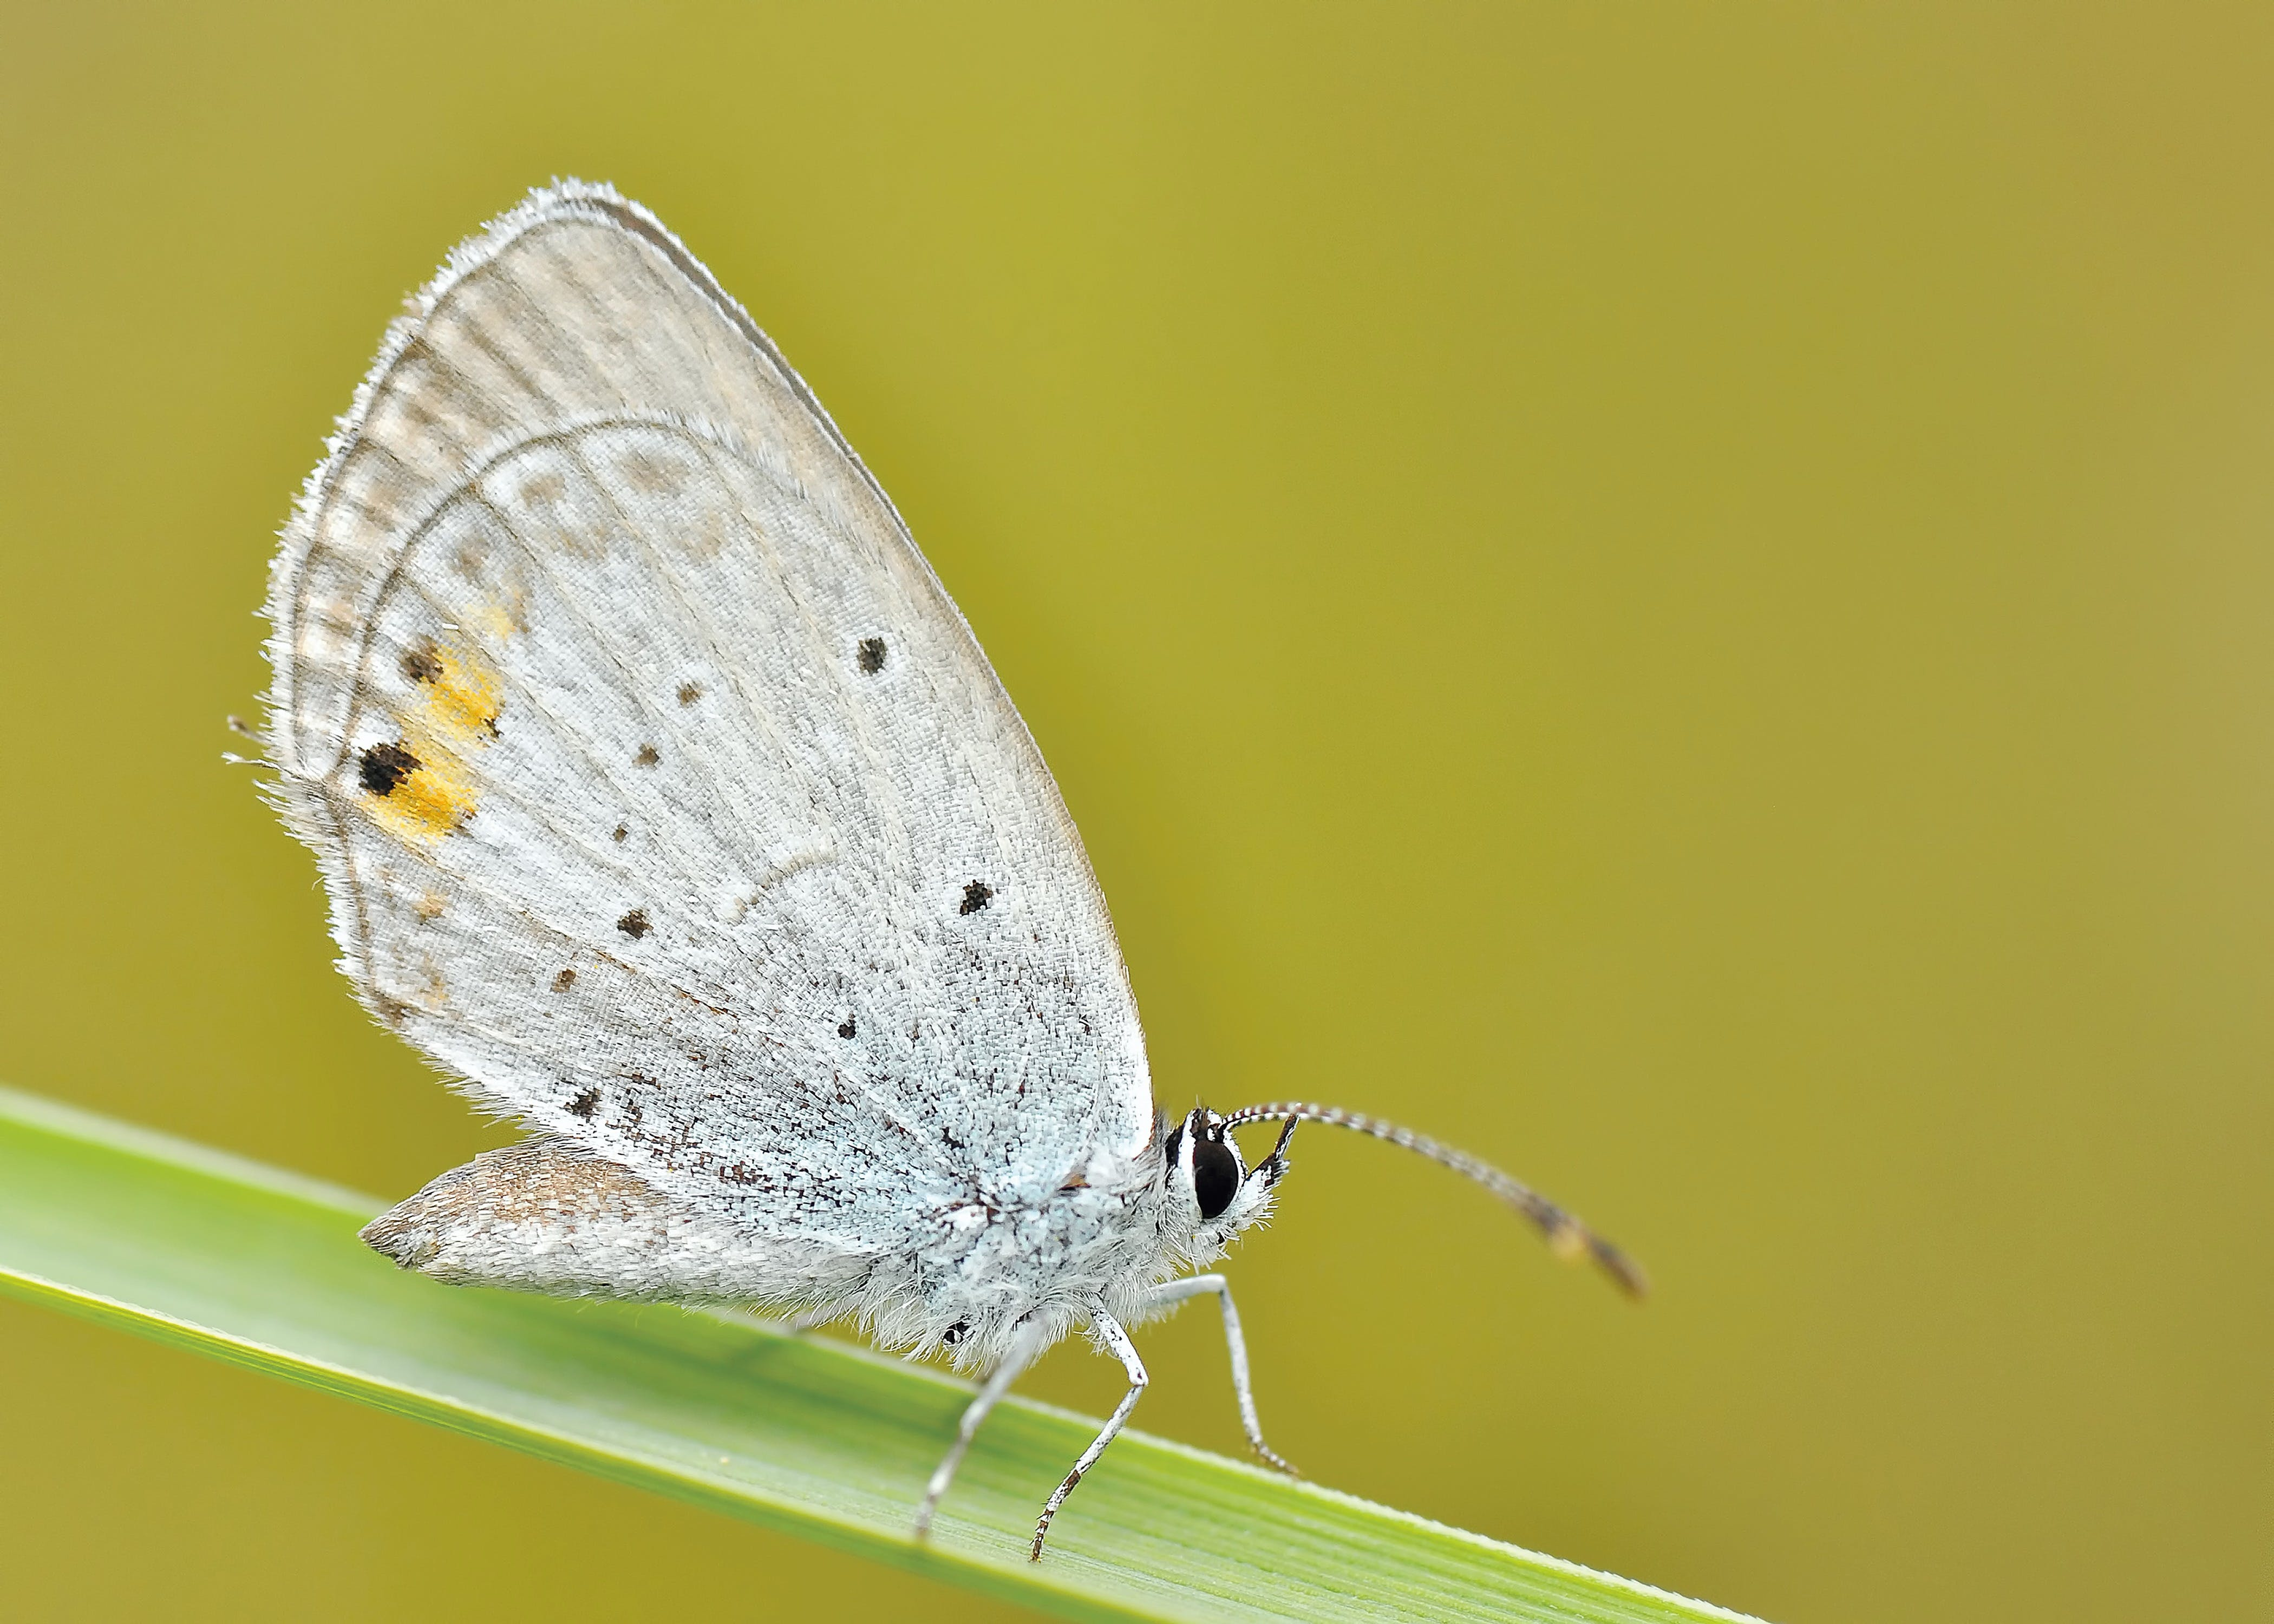 Grey Butterfly on Green Stem